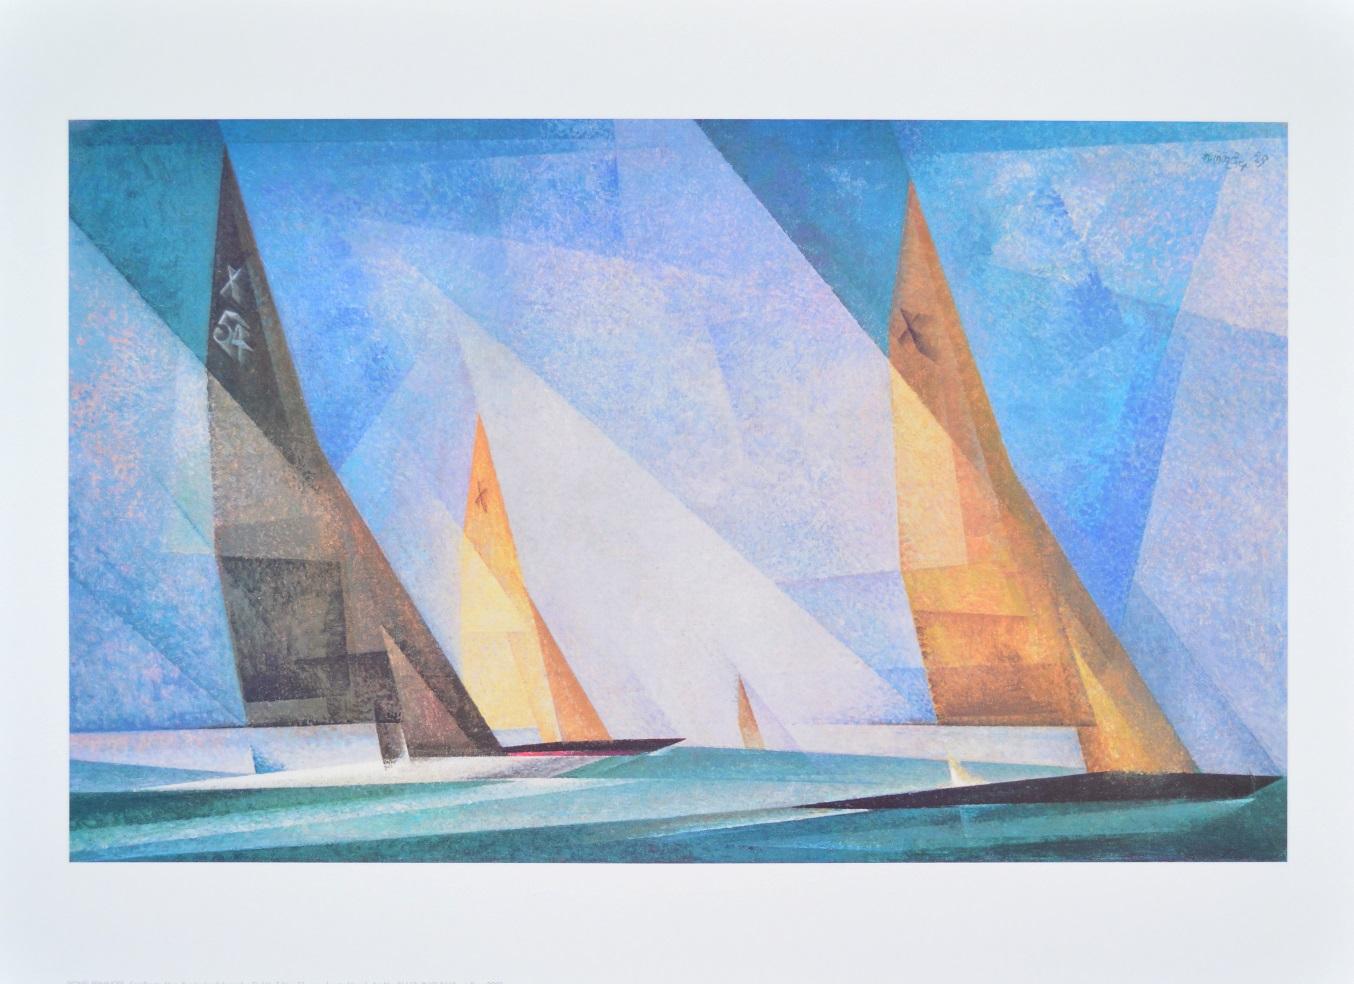 Lyonel Feininger Segelboote Poster Kunstdruck Bild 50x70 cm   eBay